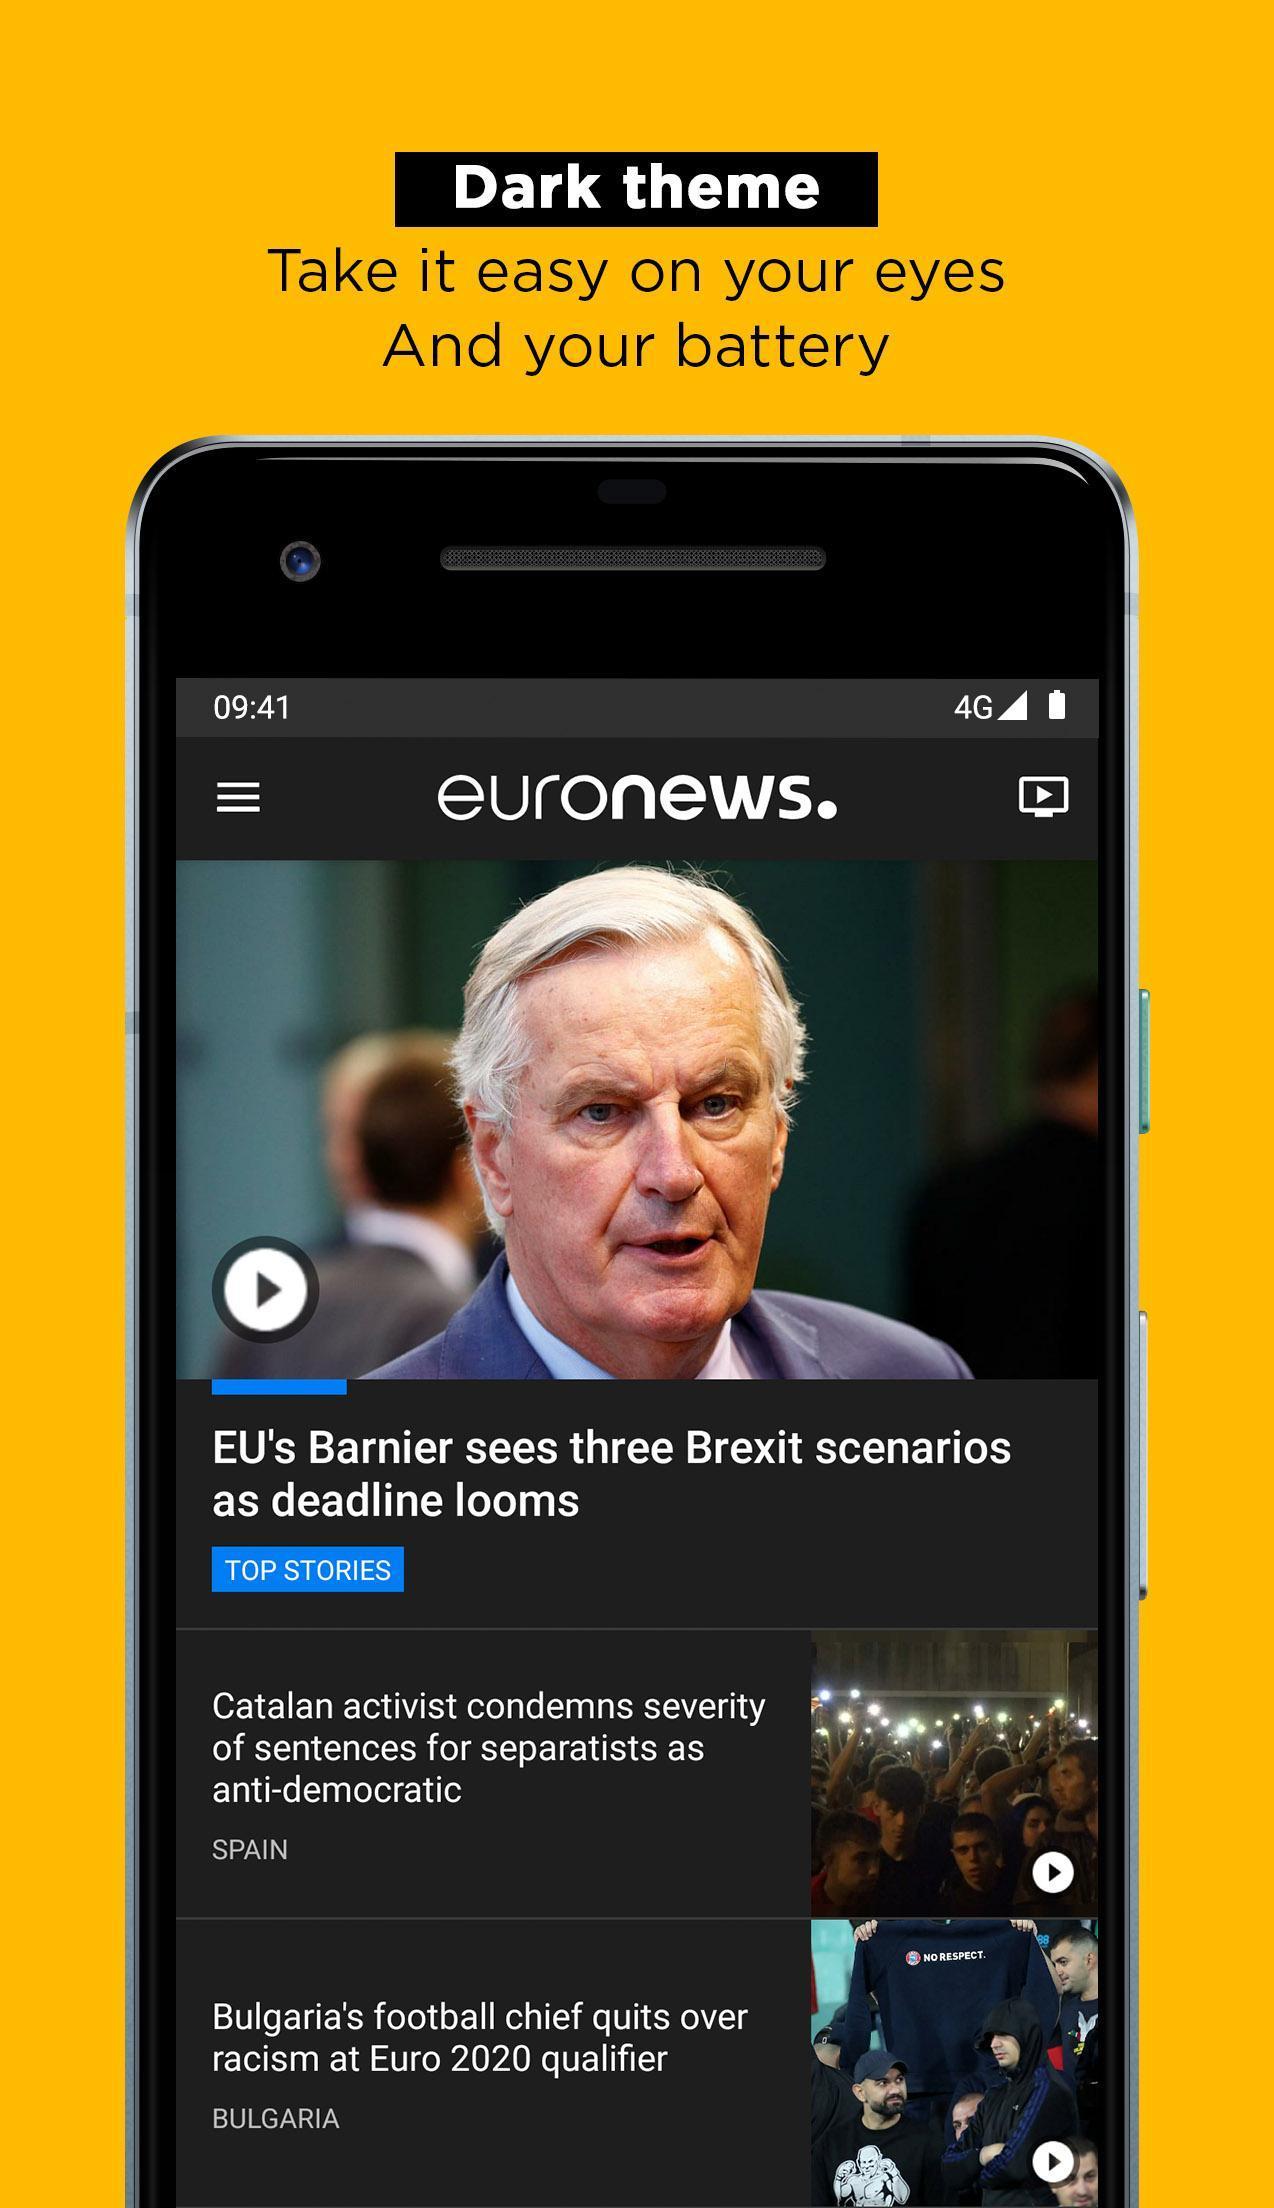 Euronews Daily breaking world news & Live TV 5.2.1 Screenshot 2